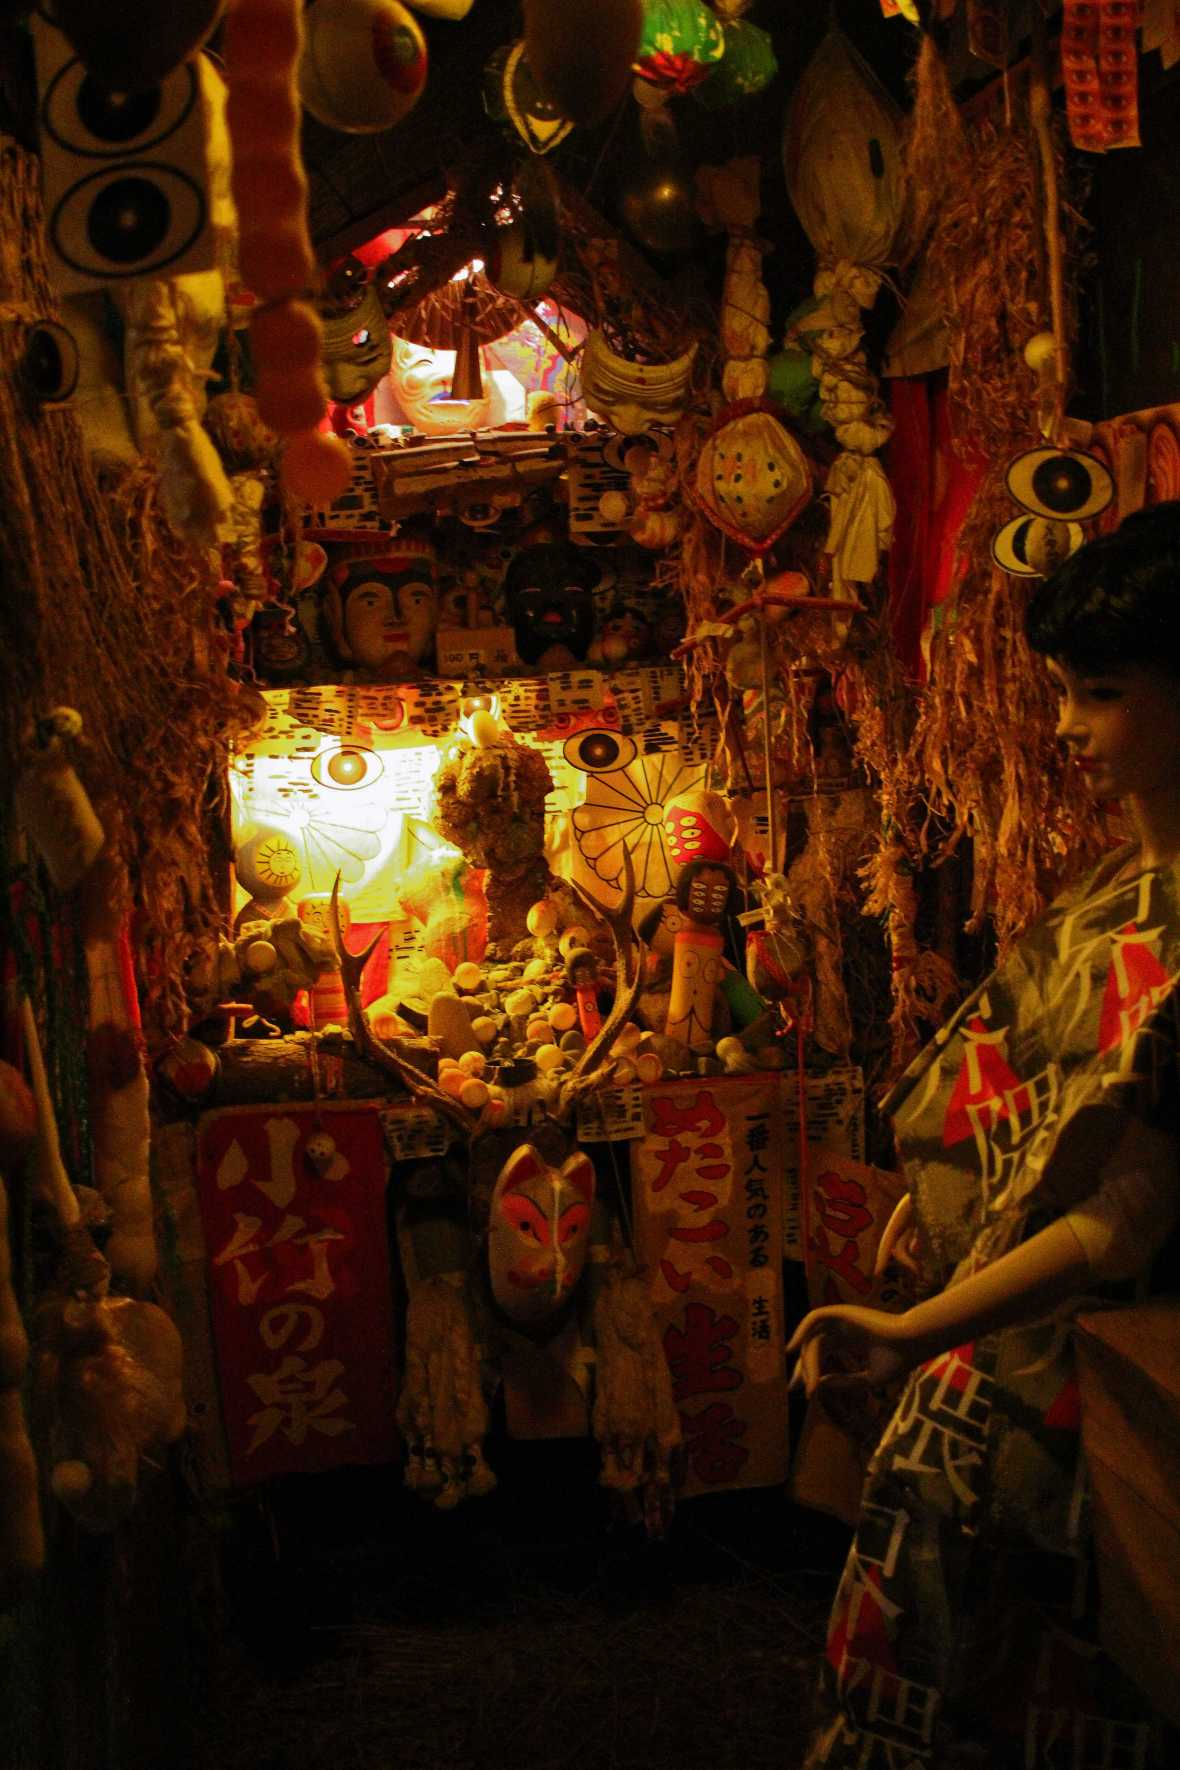 laurent ibanez derriere la colline Izakaya muraya toilettes2